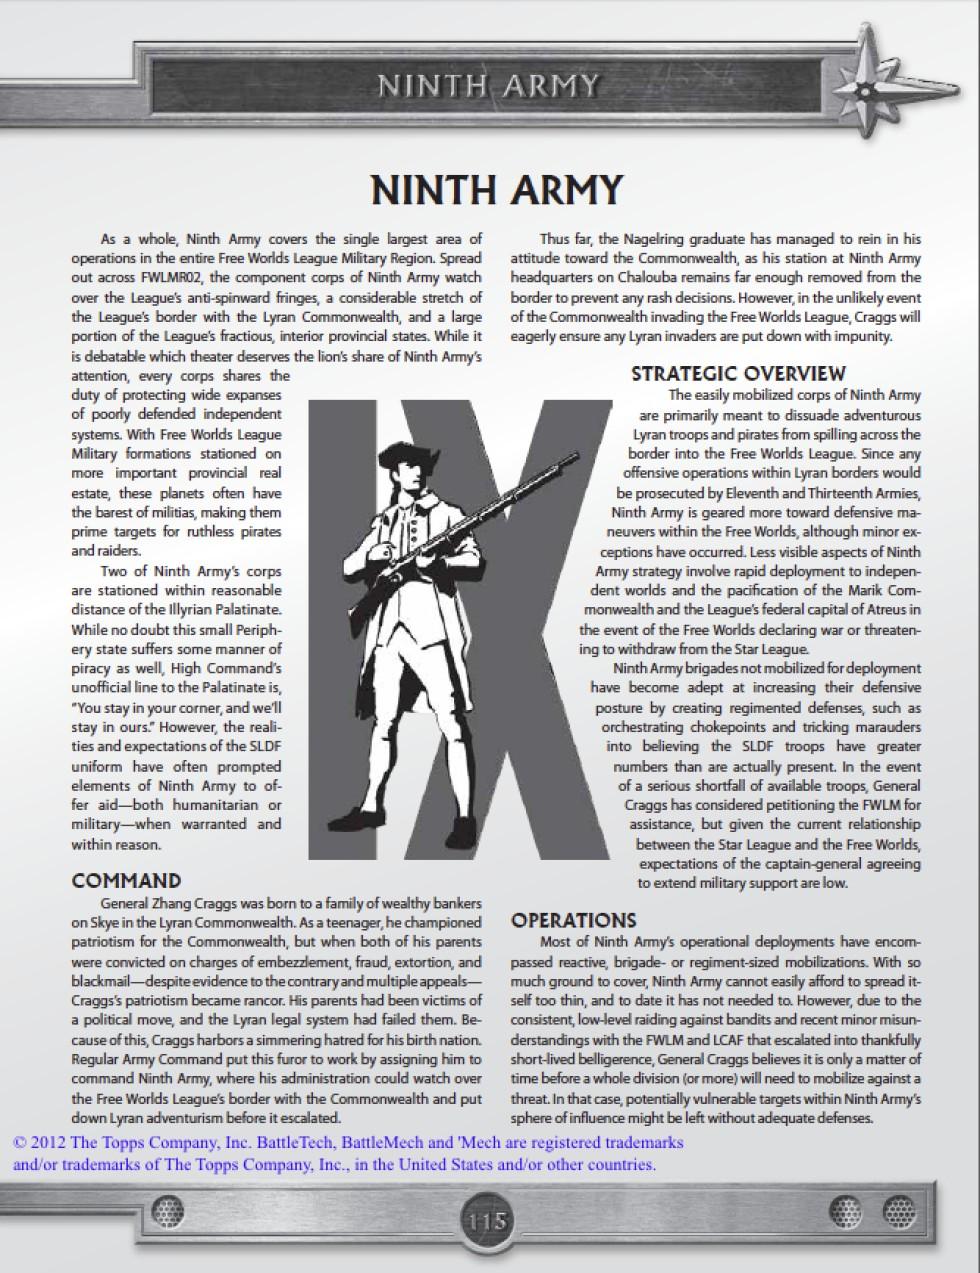 BattleTech: Field Manual SLDF – Writing sample